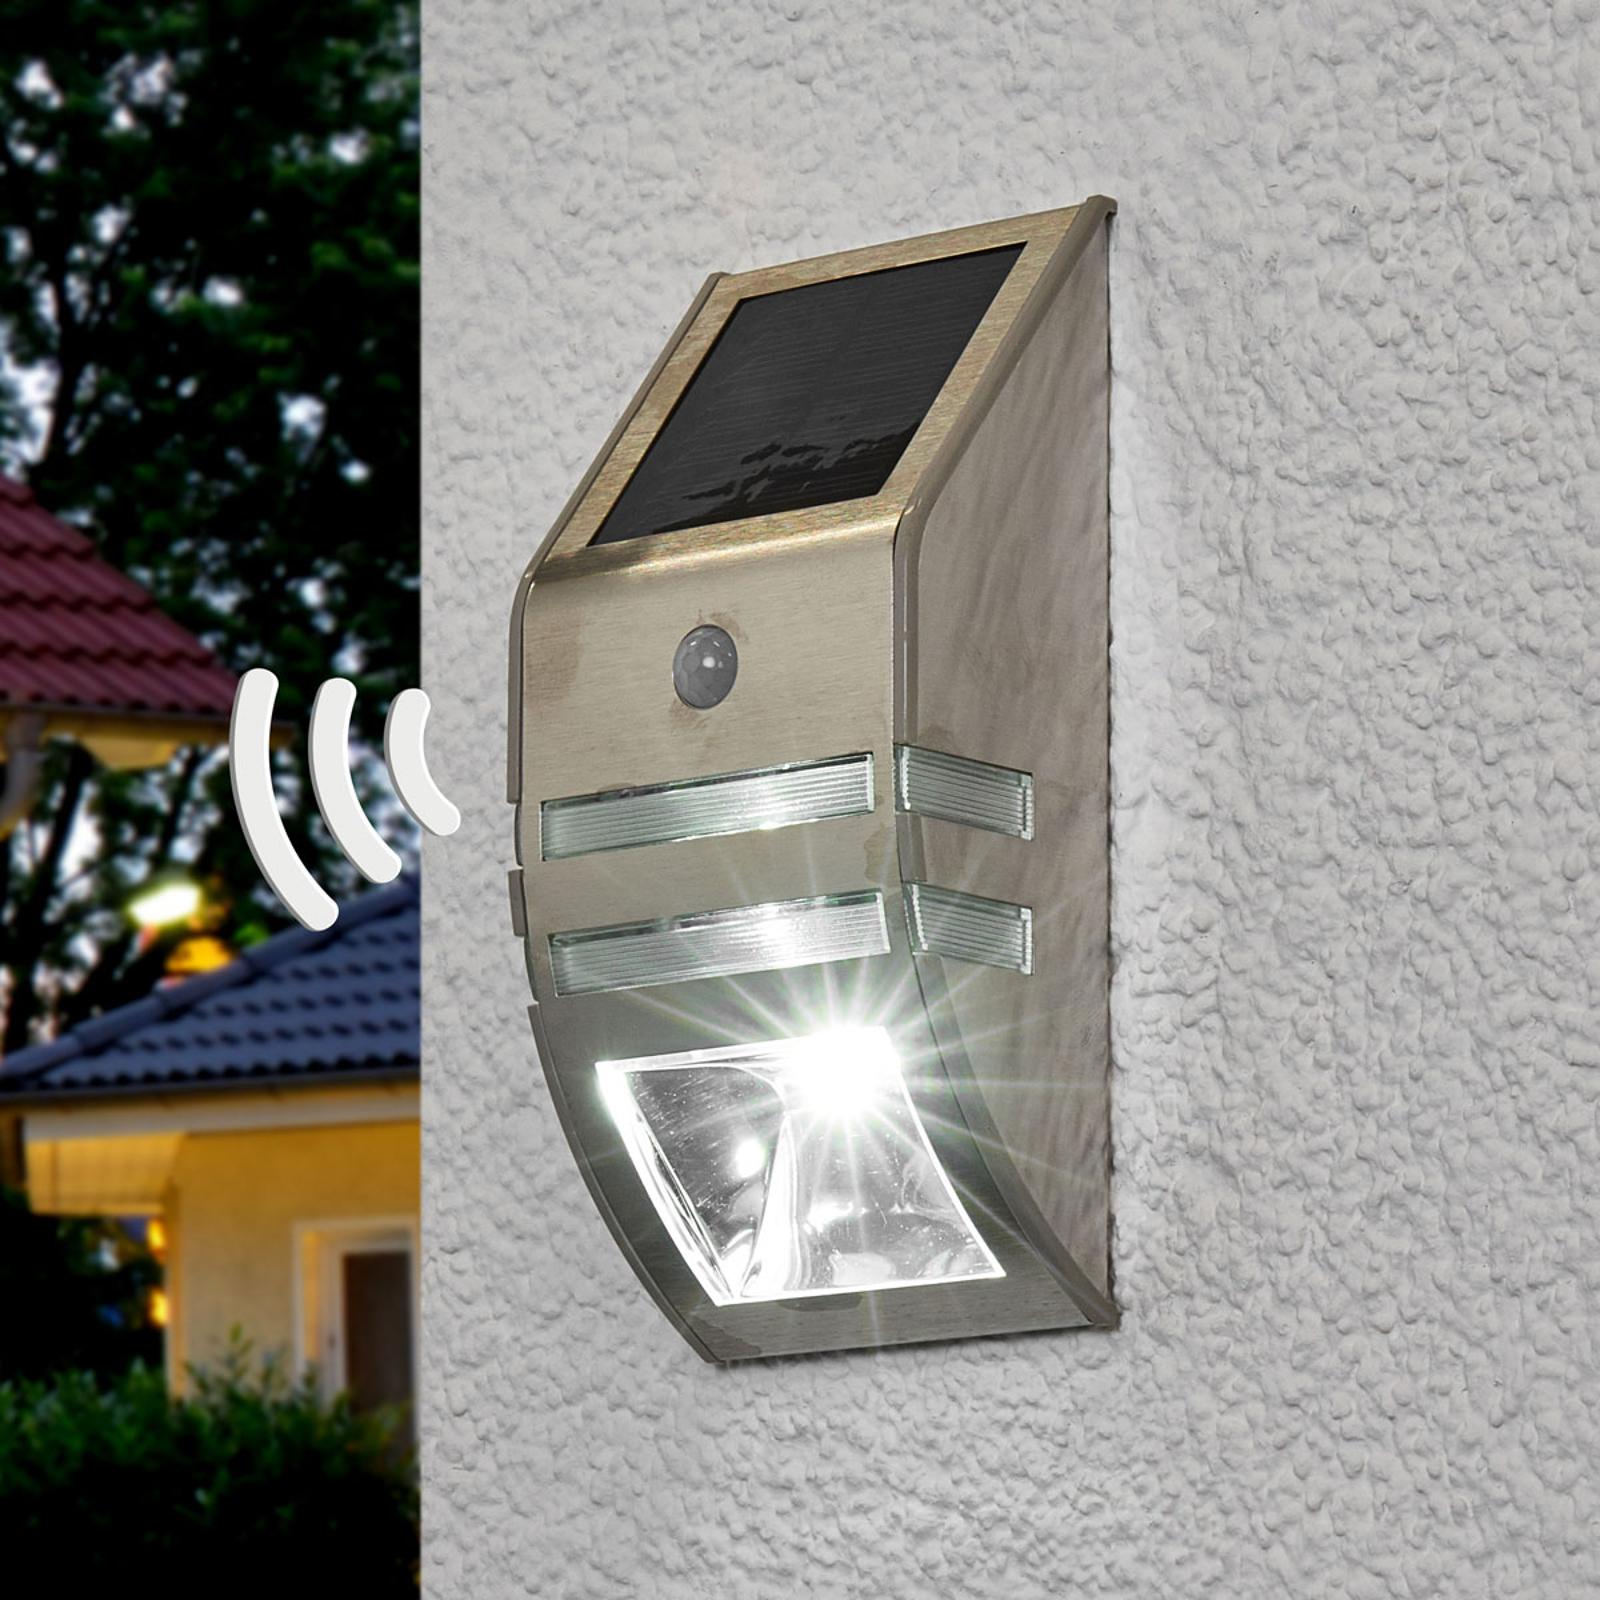 Soldriven LED-vägglampa Sol WL-2007, rörelsesensor